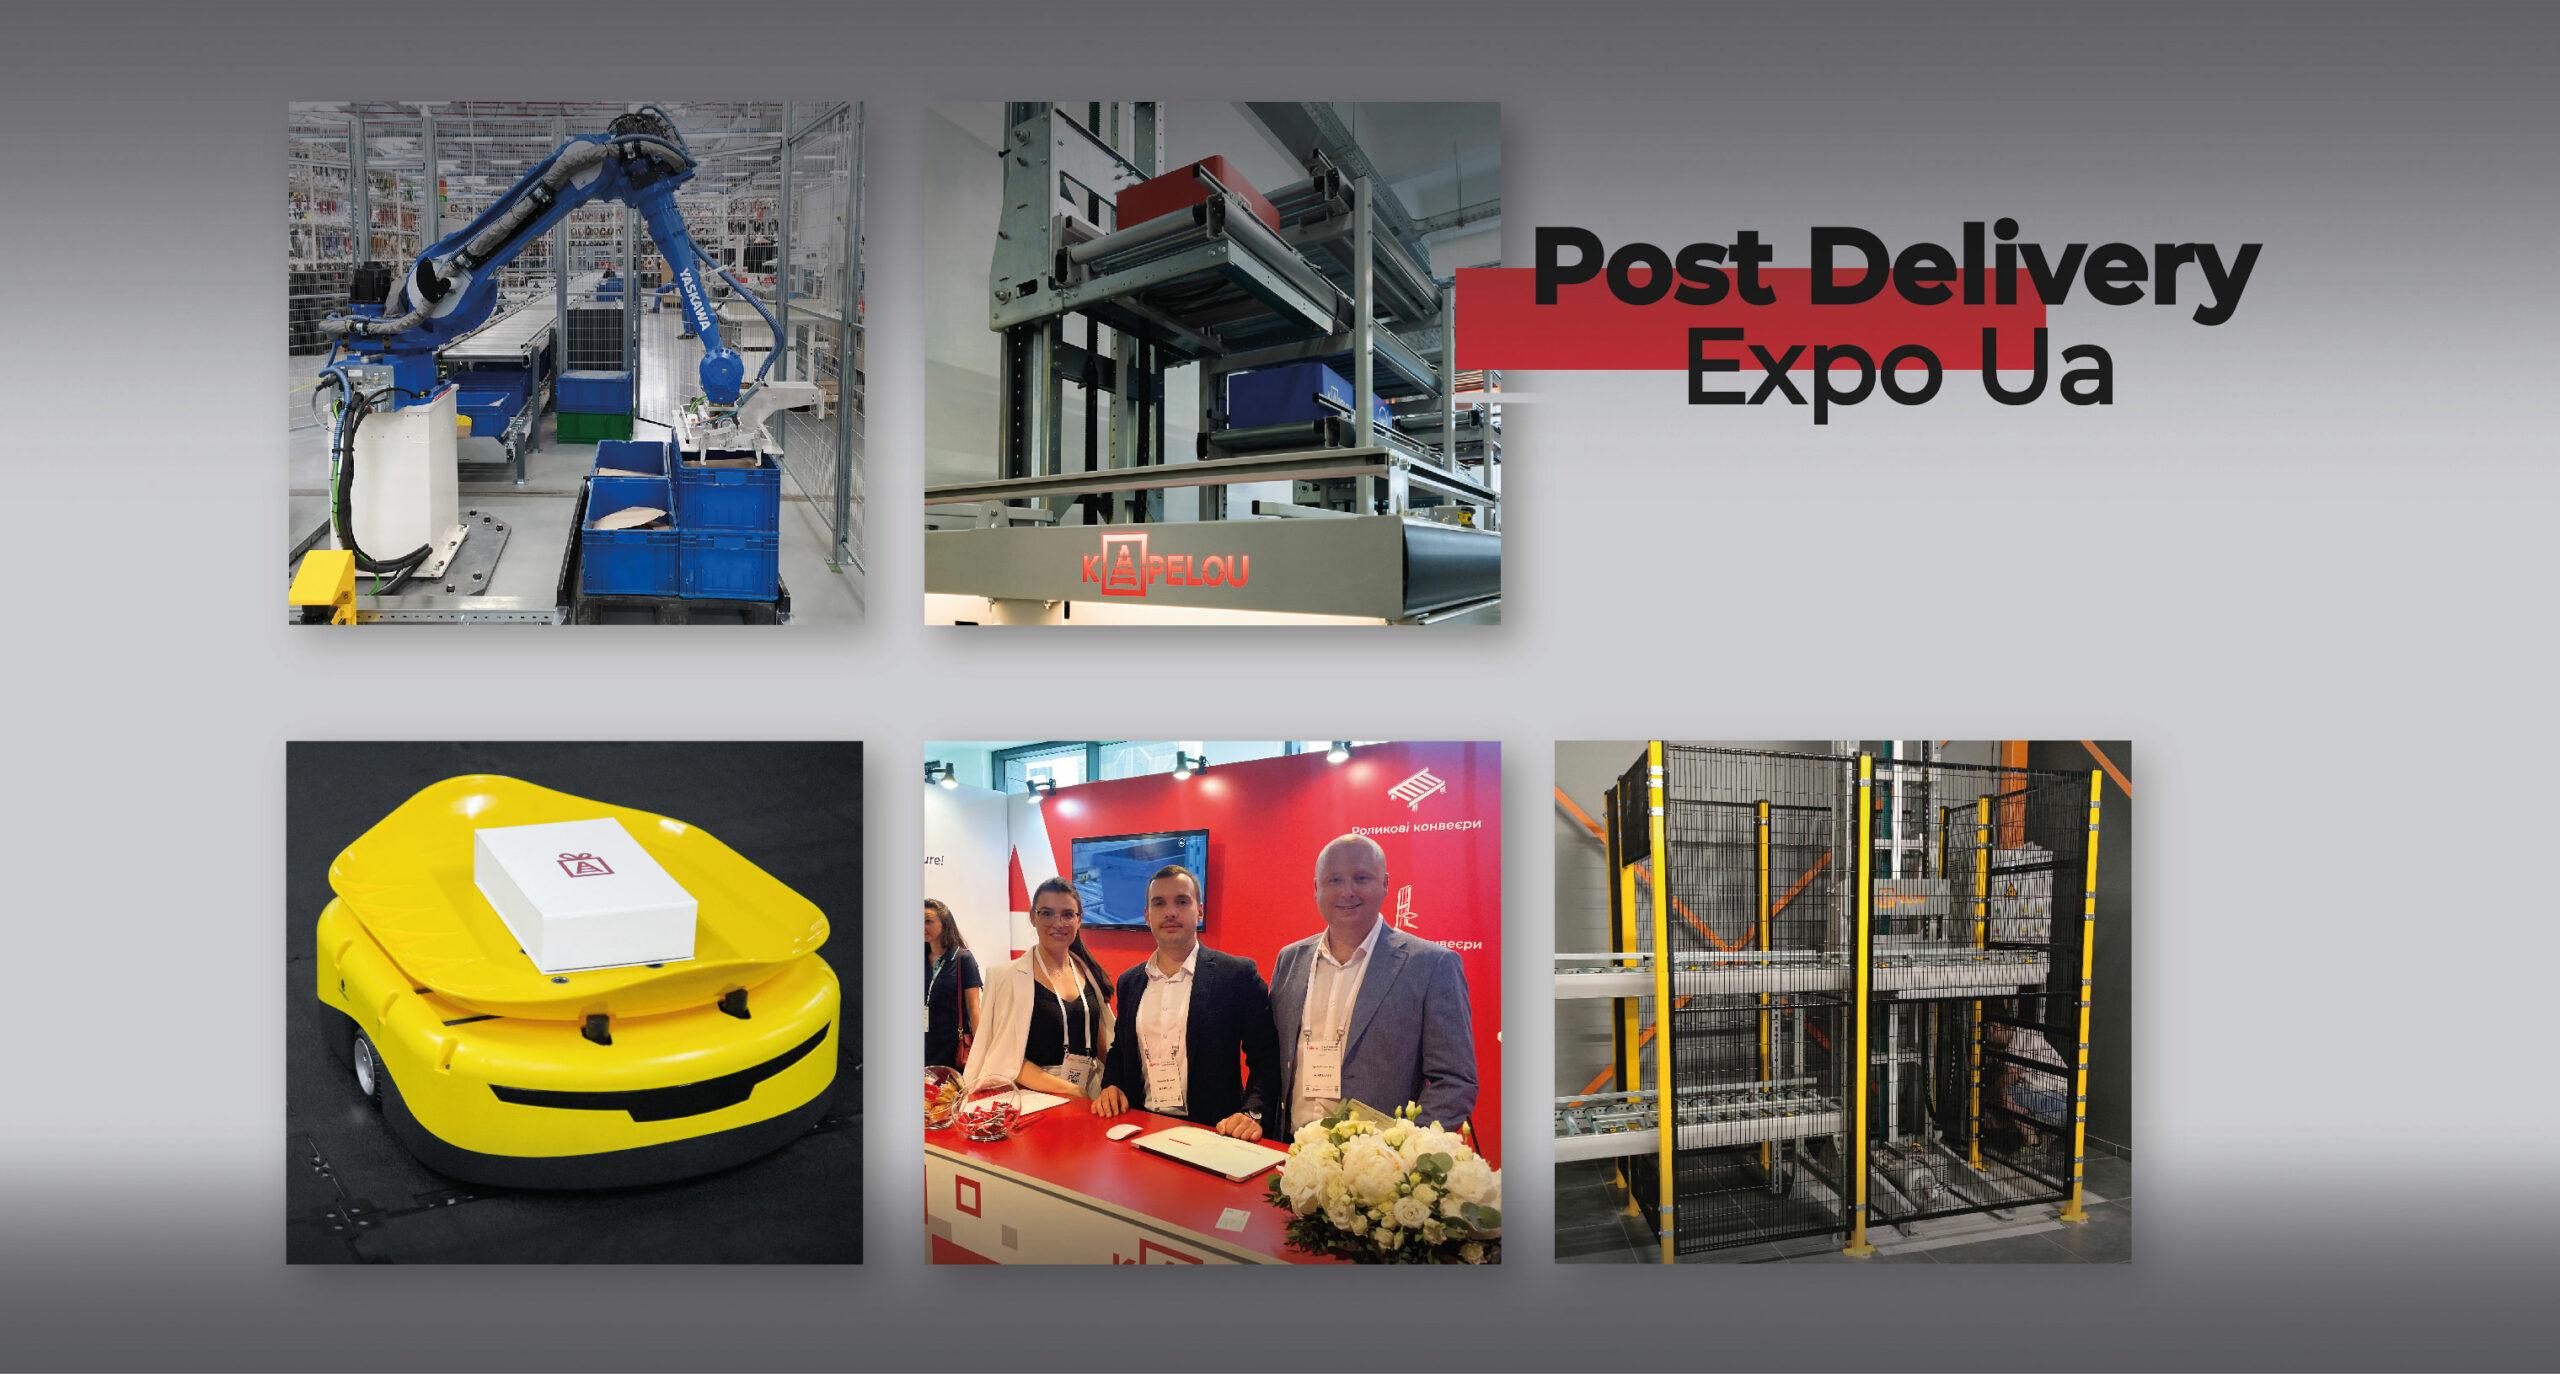 Post & Delivery Expo UA: KAPELOU is preparing to present innovative technologies - 8 - kapelou.com